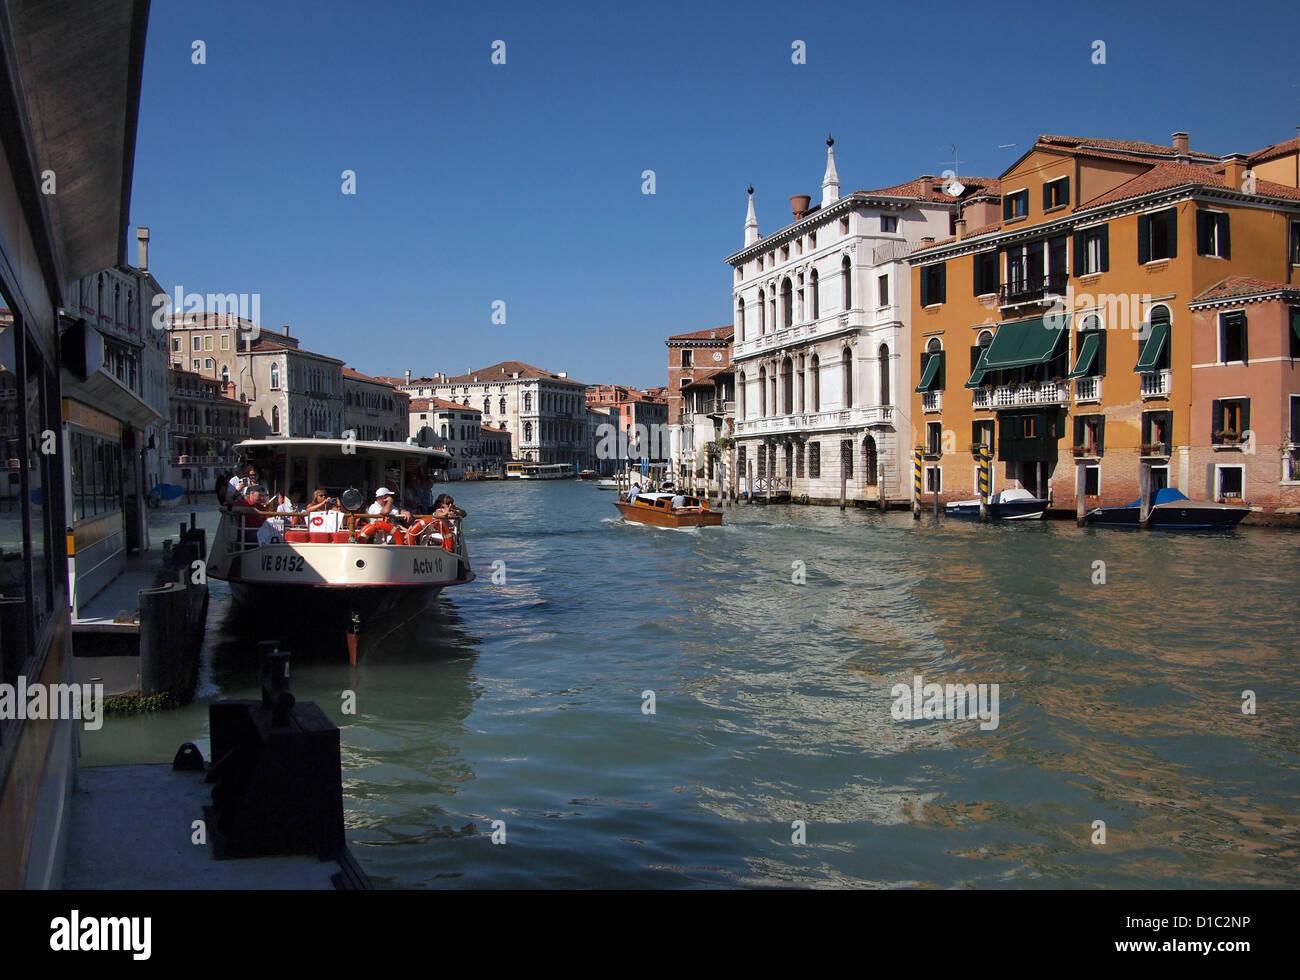 Venice - Academia vaporetto stop - Stock Image